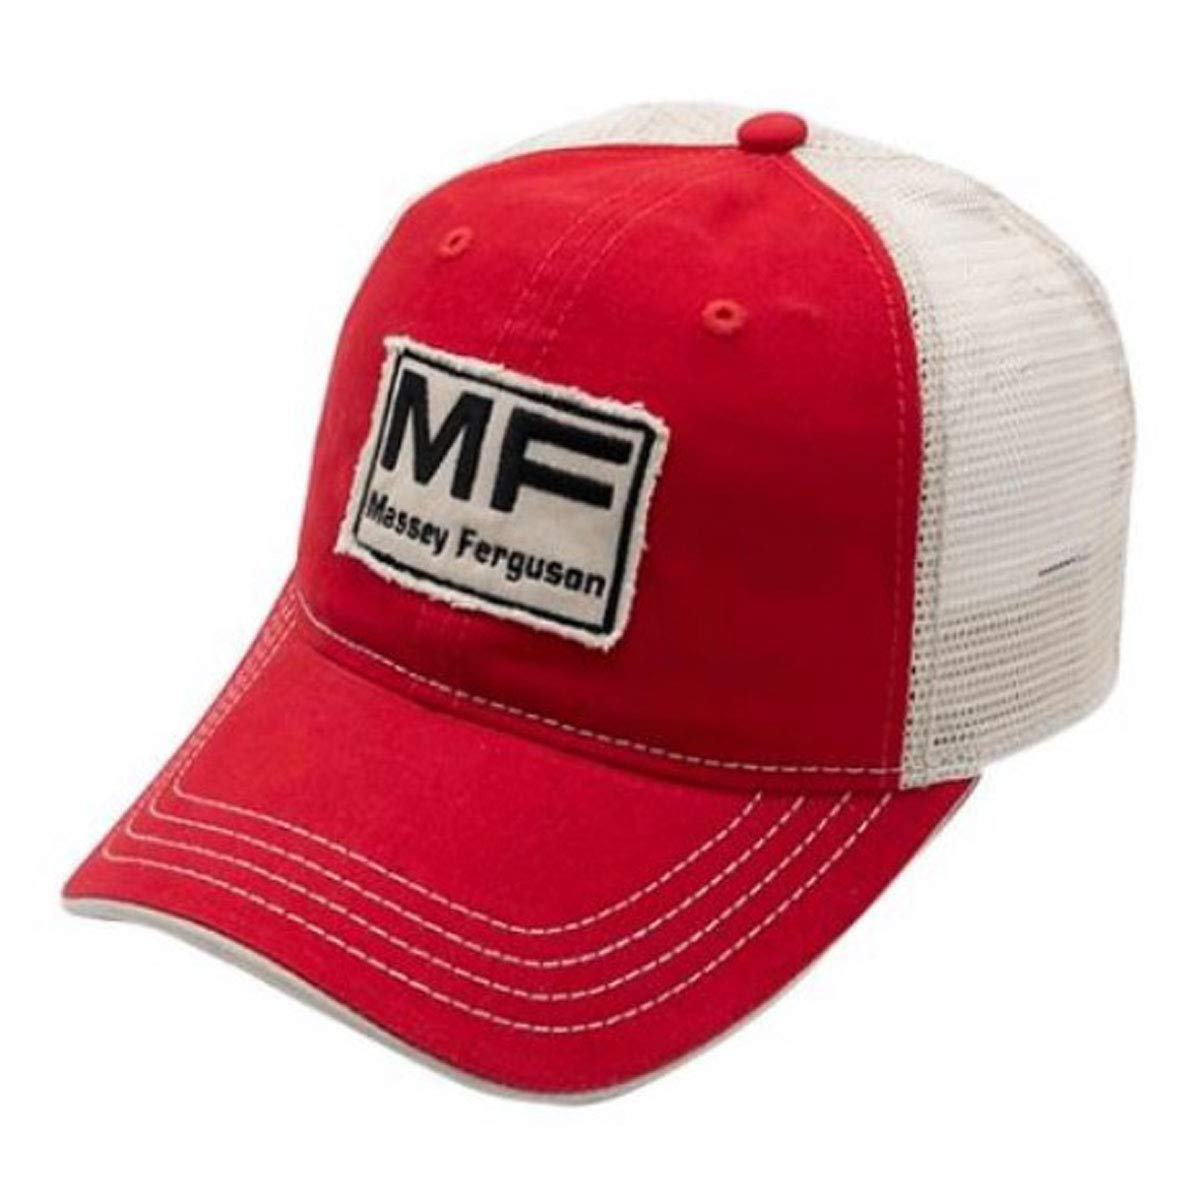 Massey Ferguson Vintage Logo Mesh Back Cap 03406C